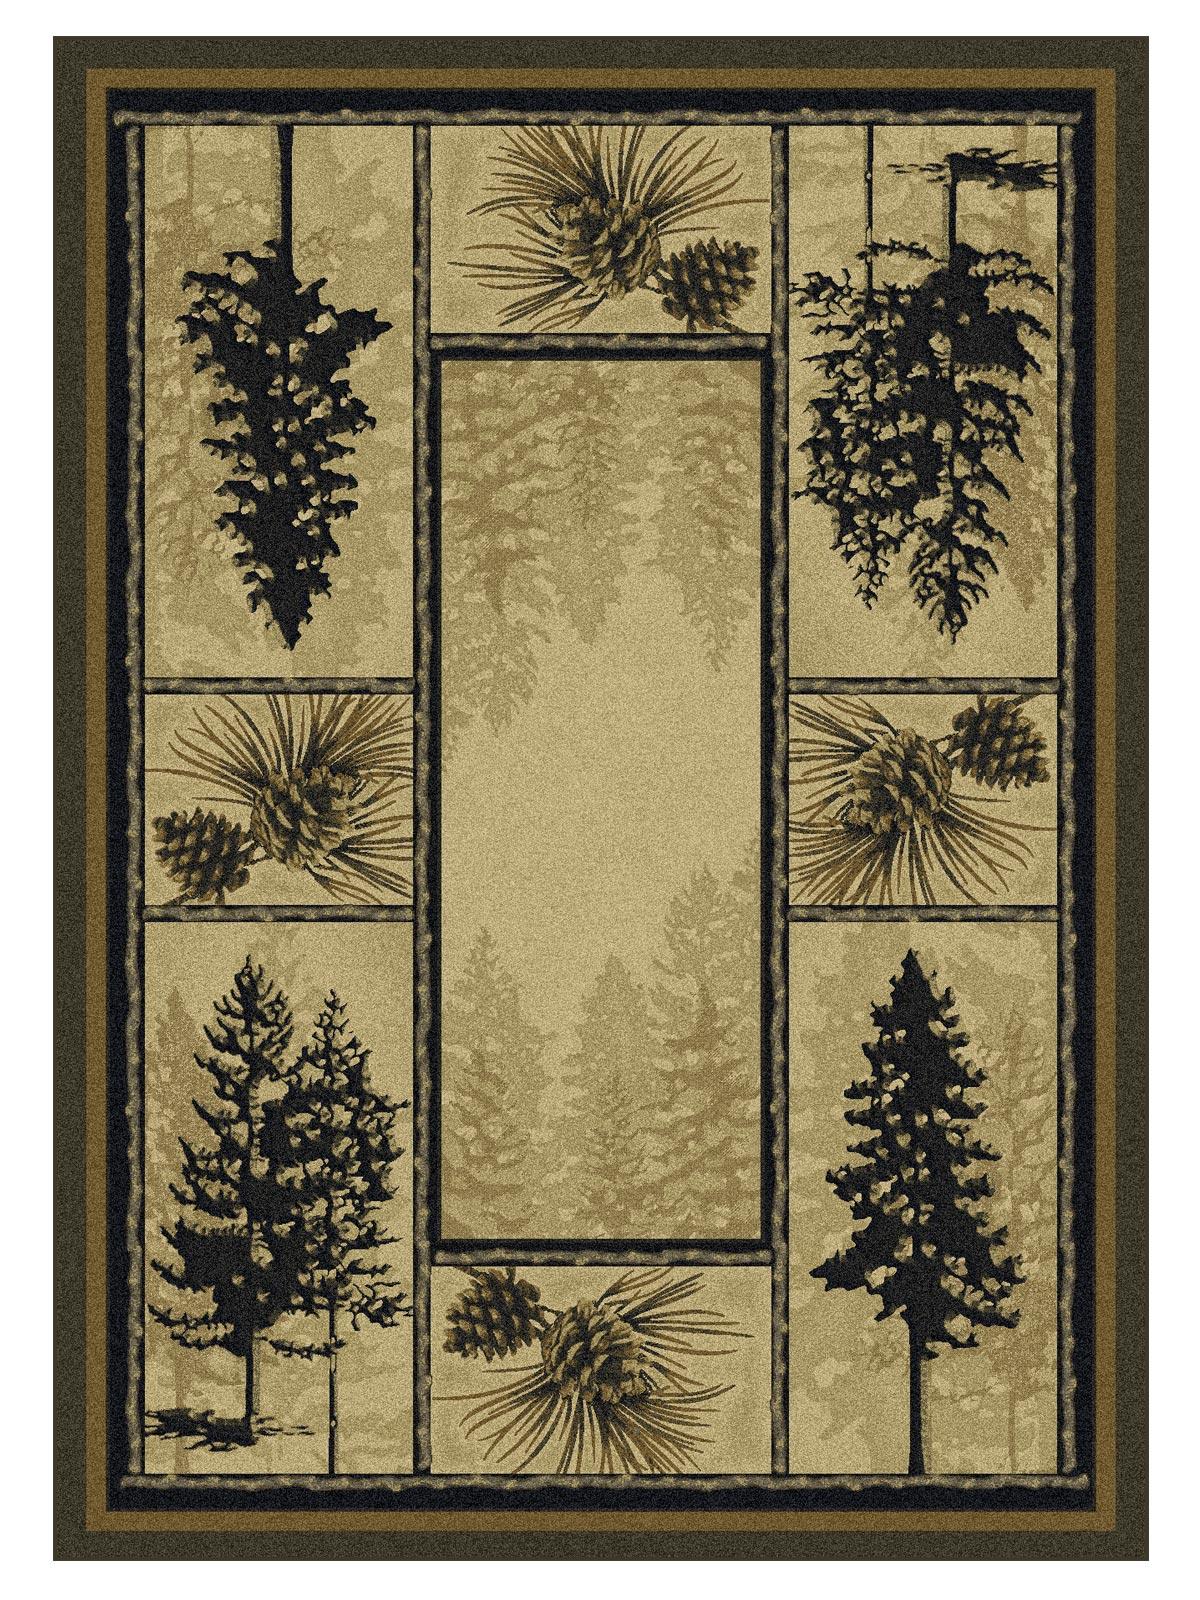 Stoic Pines.jpg